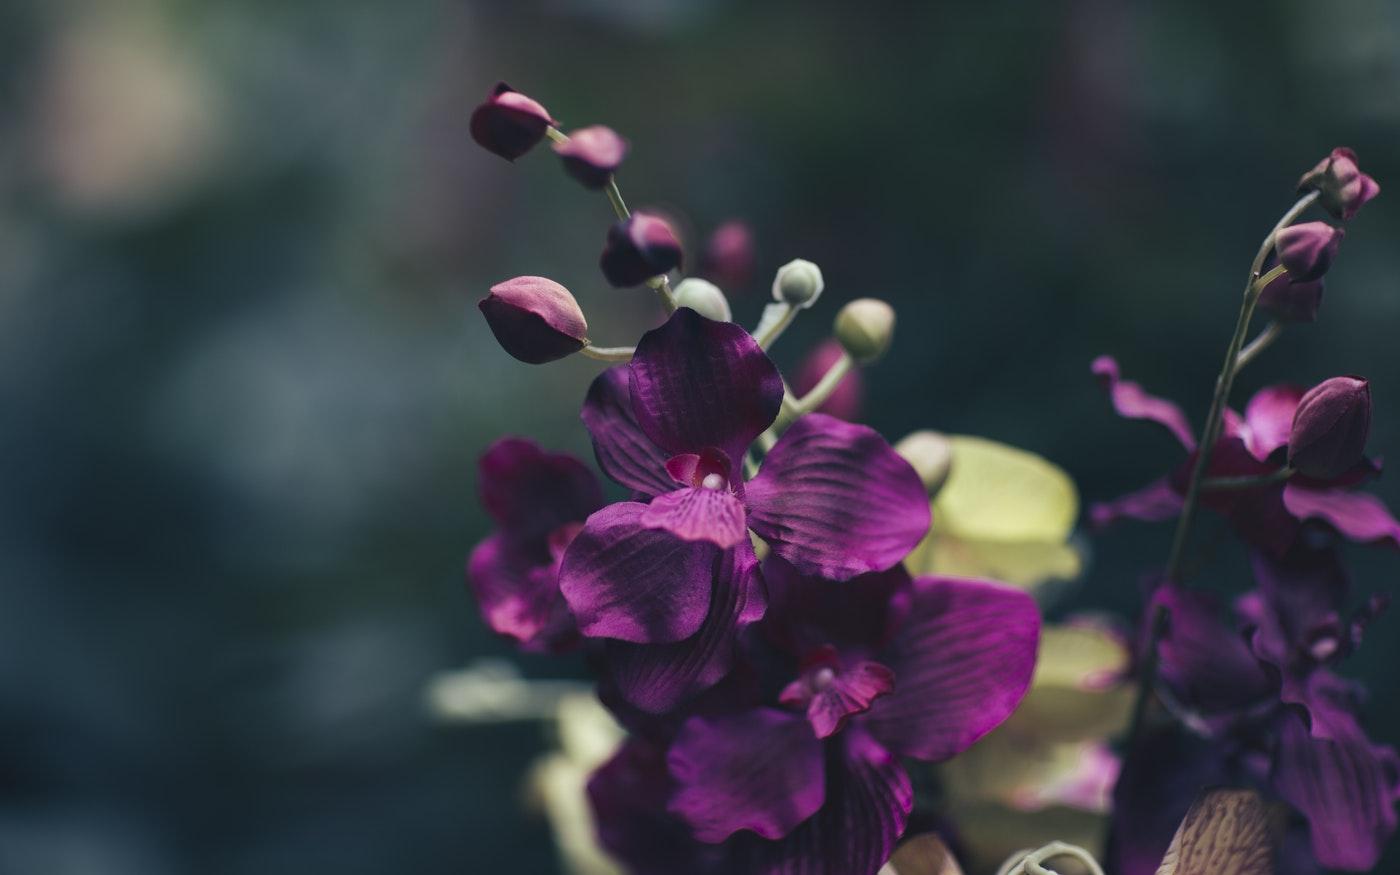 Mor orkide, purple orchid